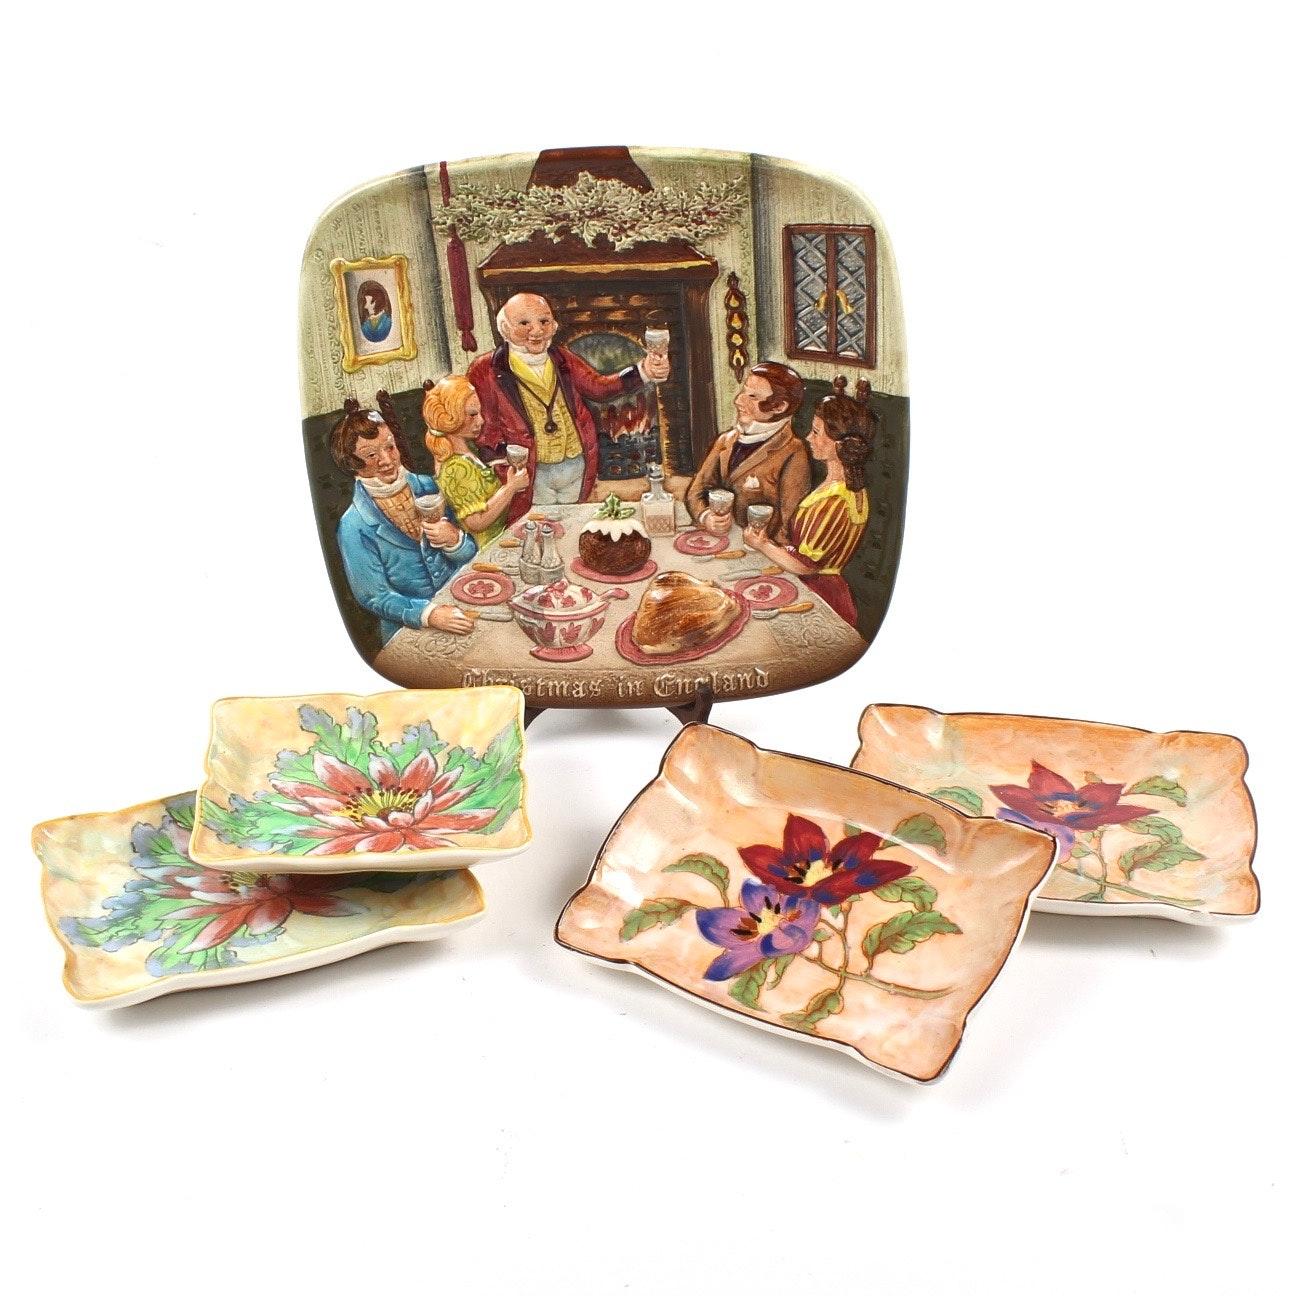 Royal Doulton Decorative Plates